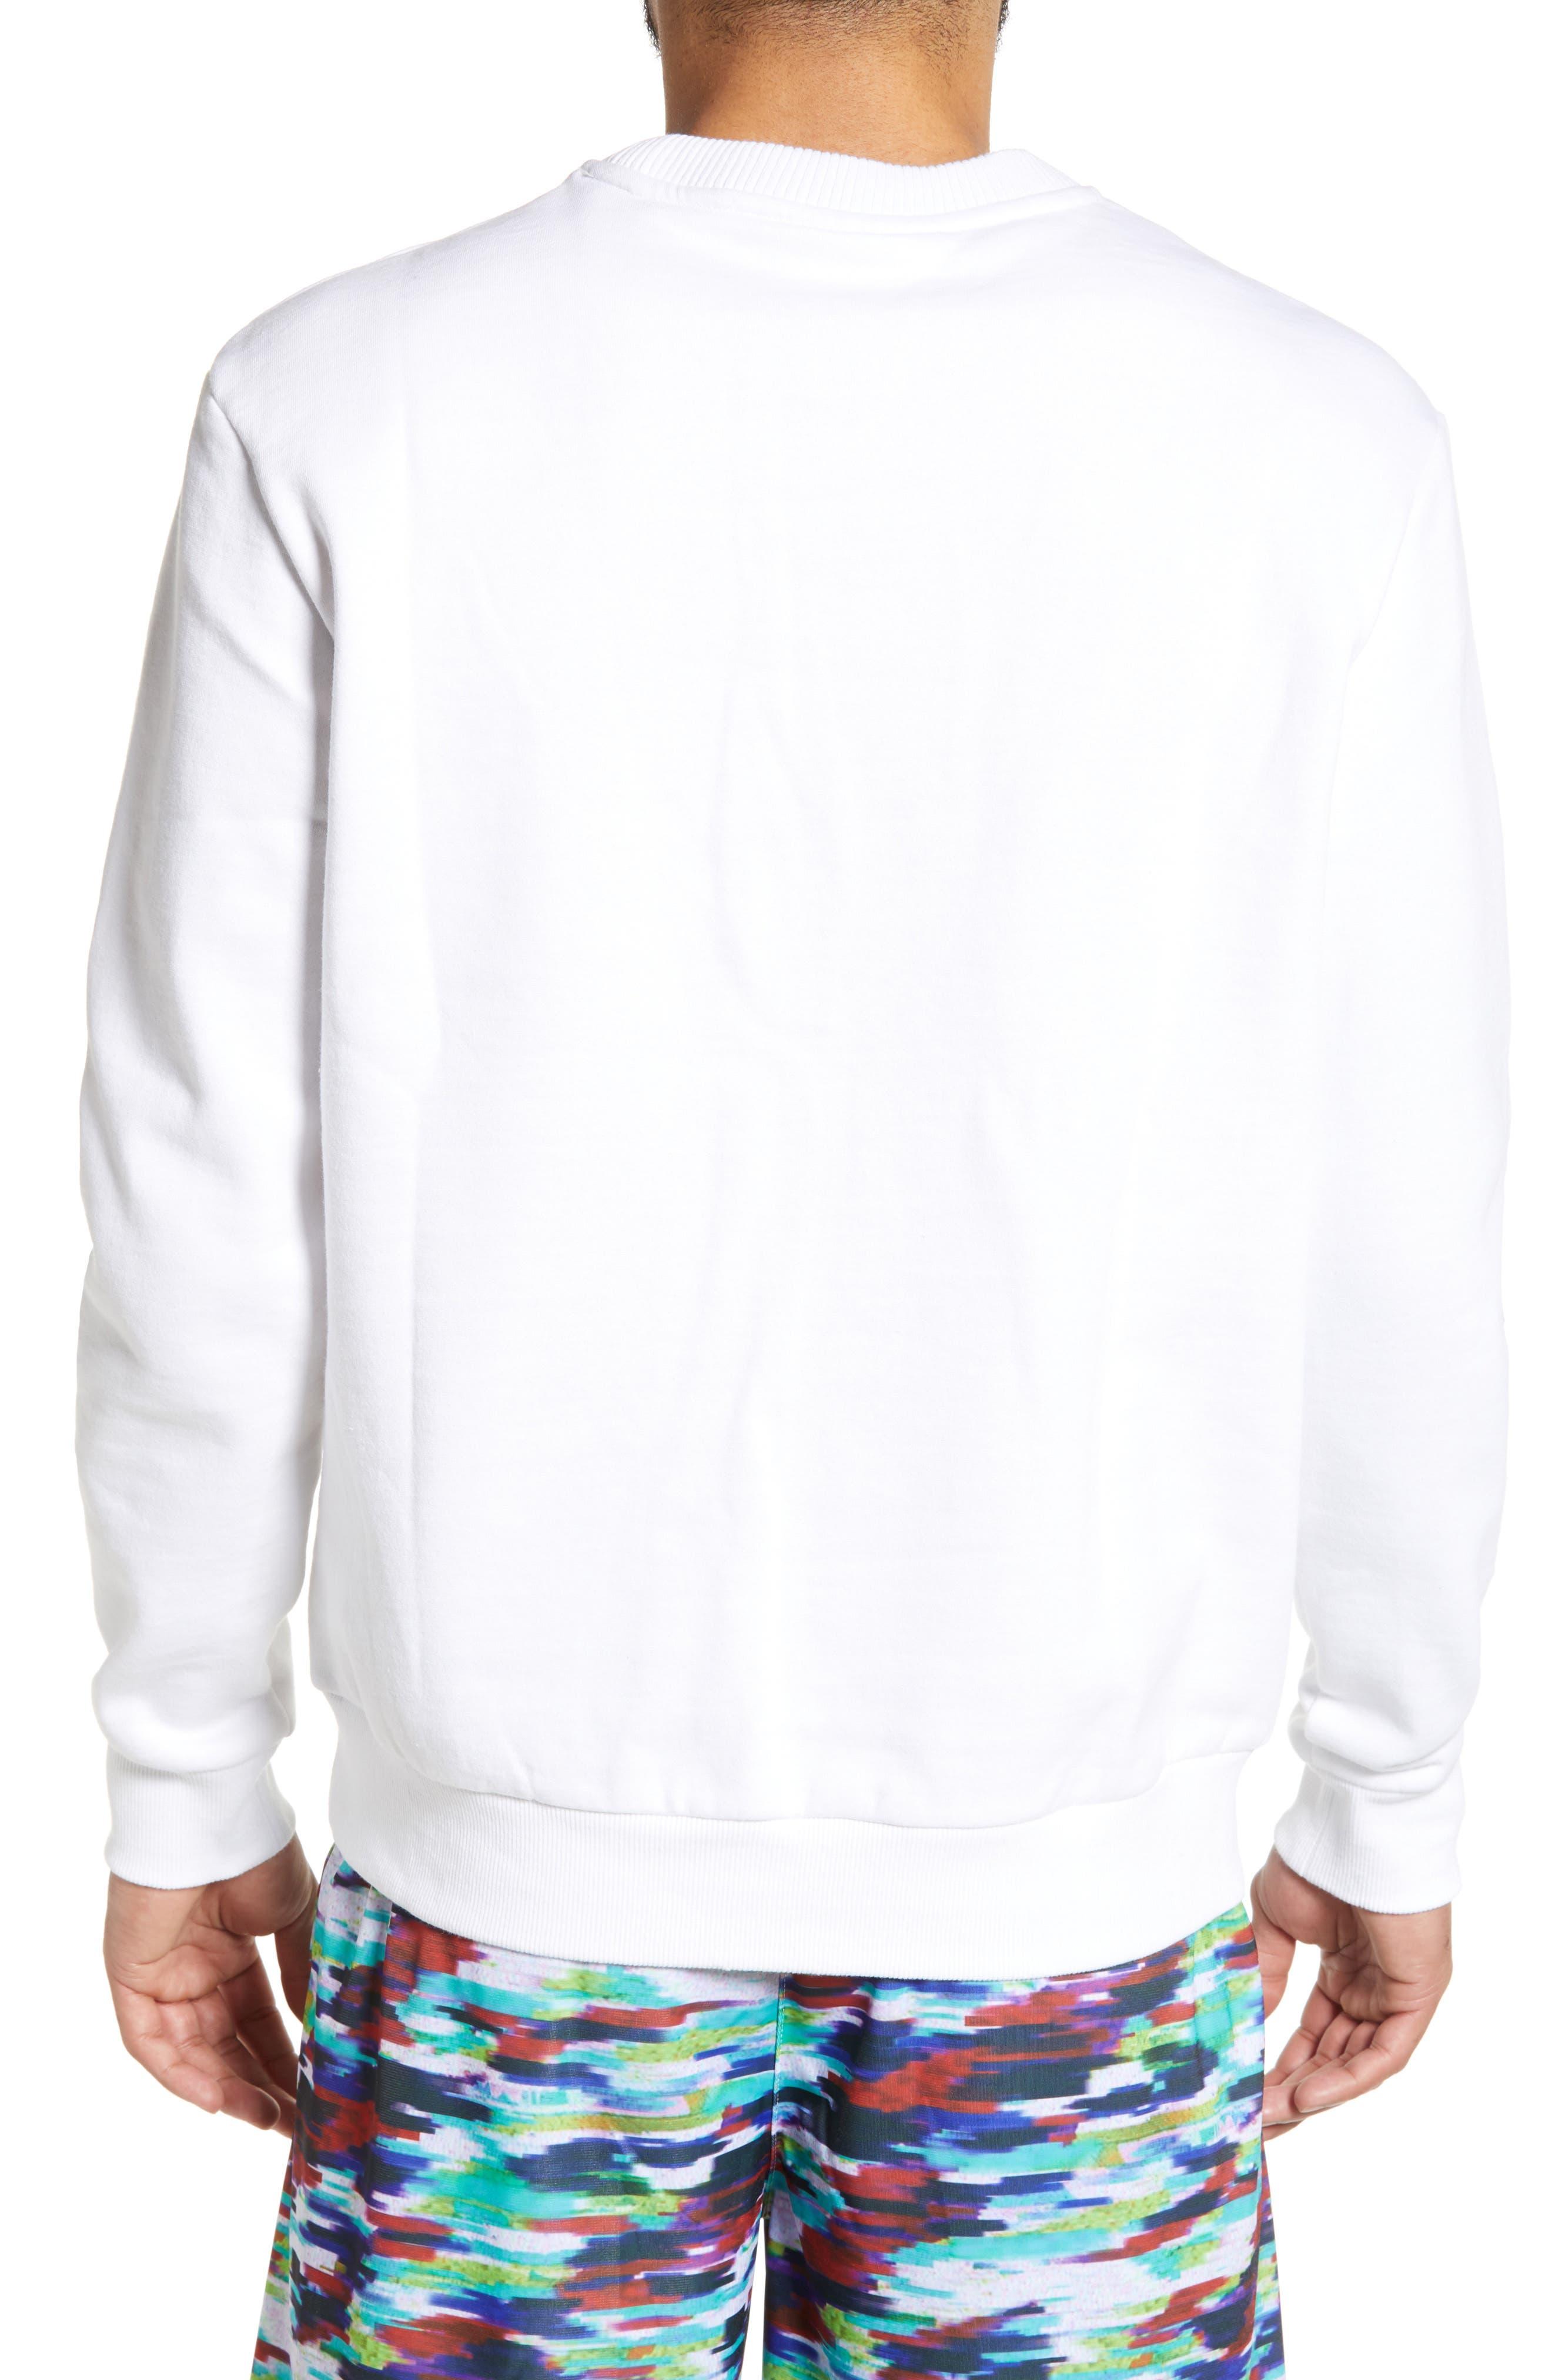 FILA, Leroy Chevron Sweatshirt, Alternate thumbnail 2, color, WHITE